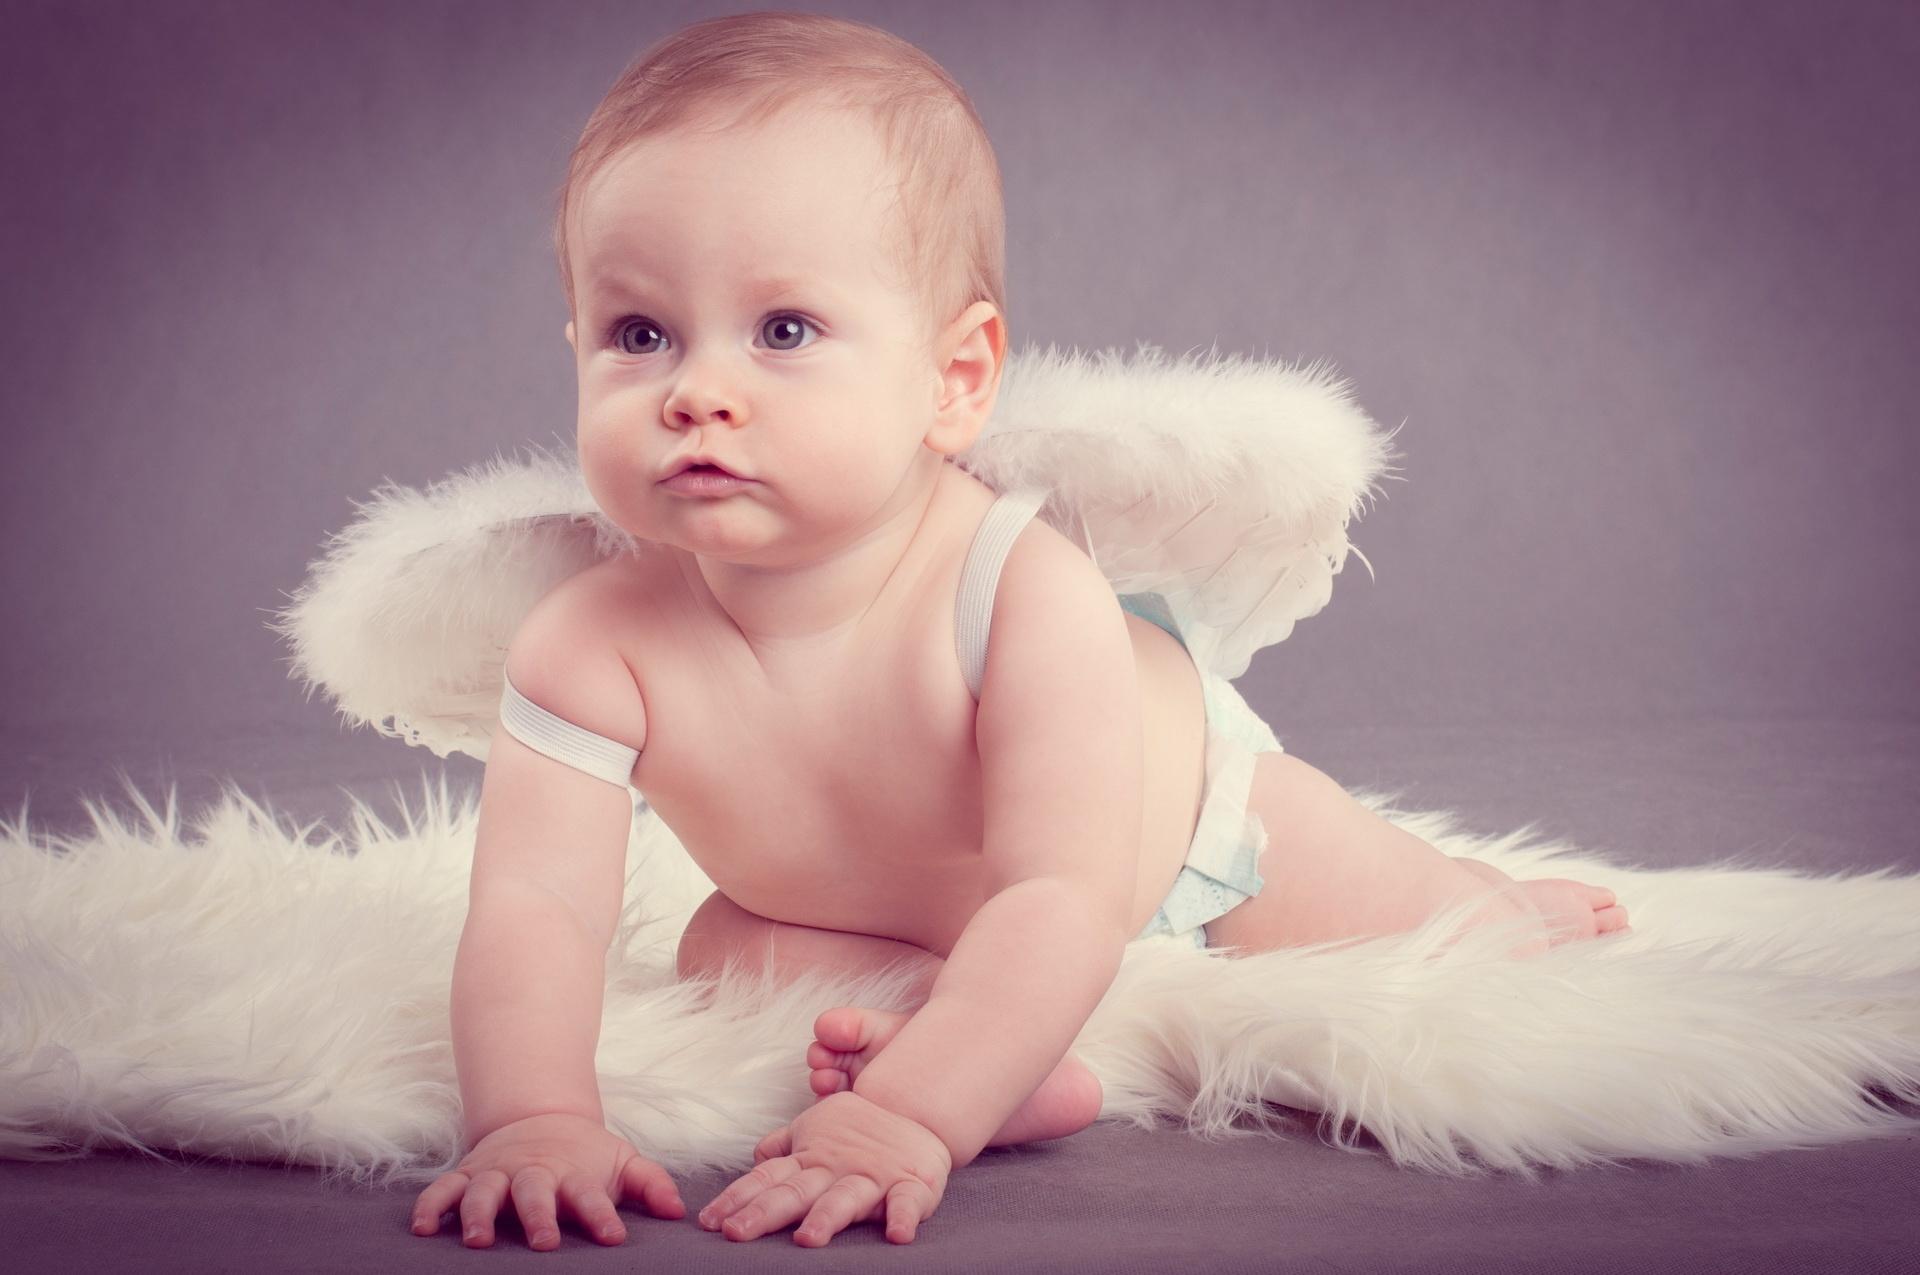 шарлям, картинки на телефон детка с крылышками доме канализация